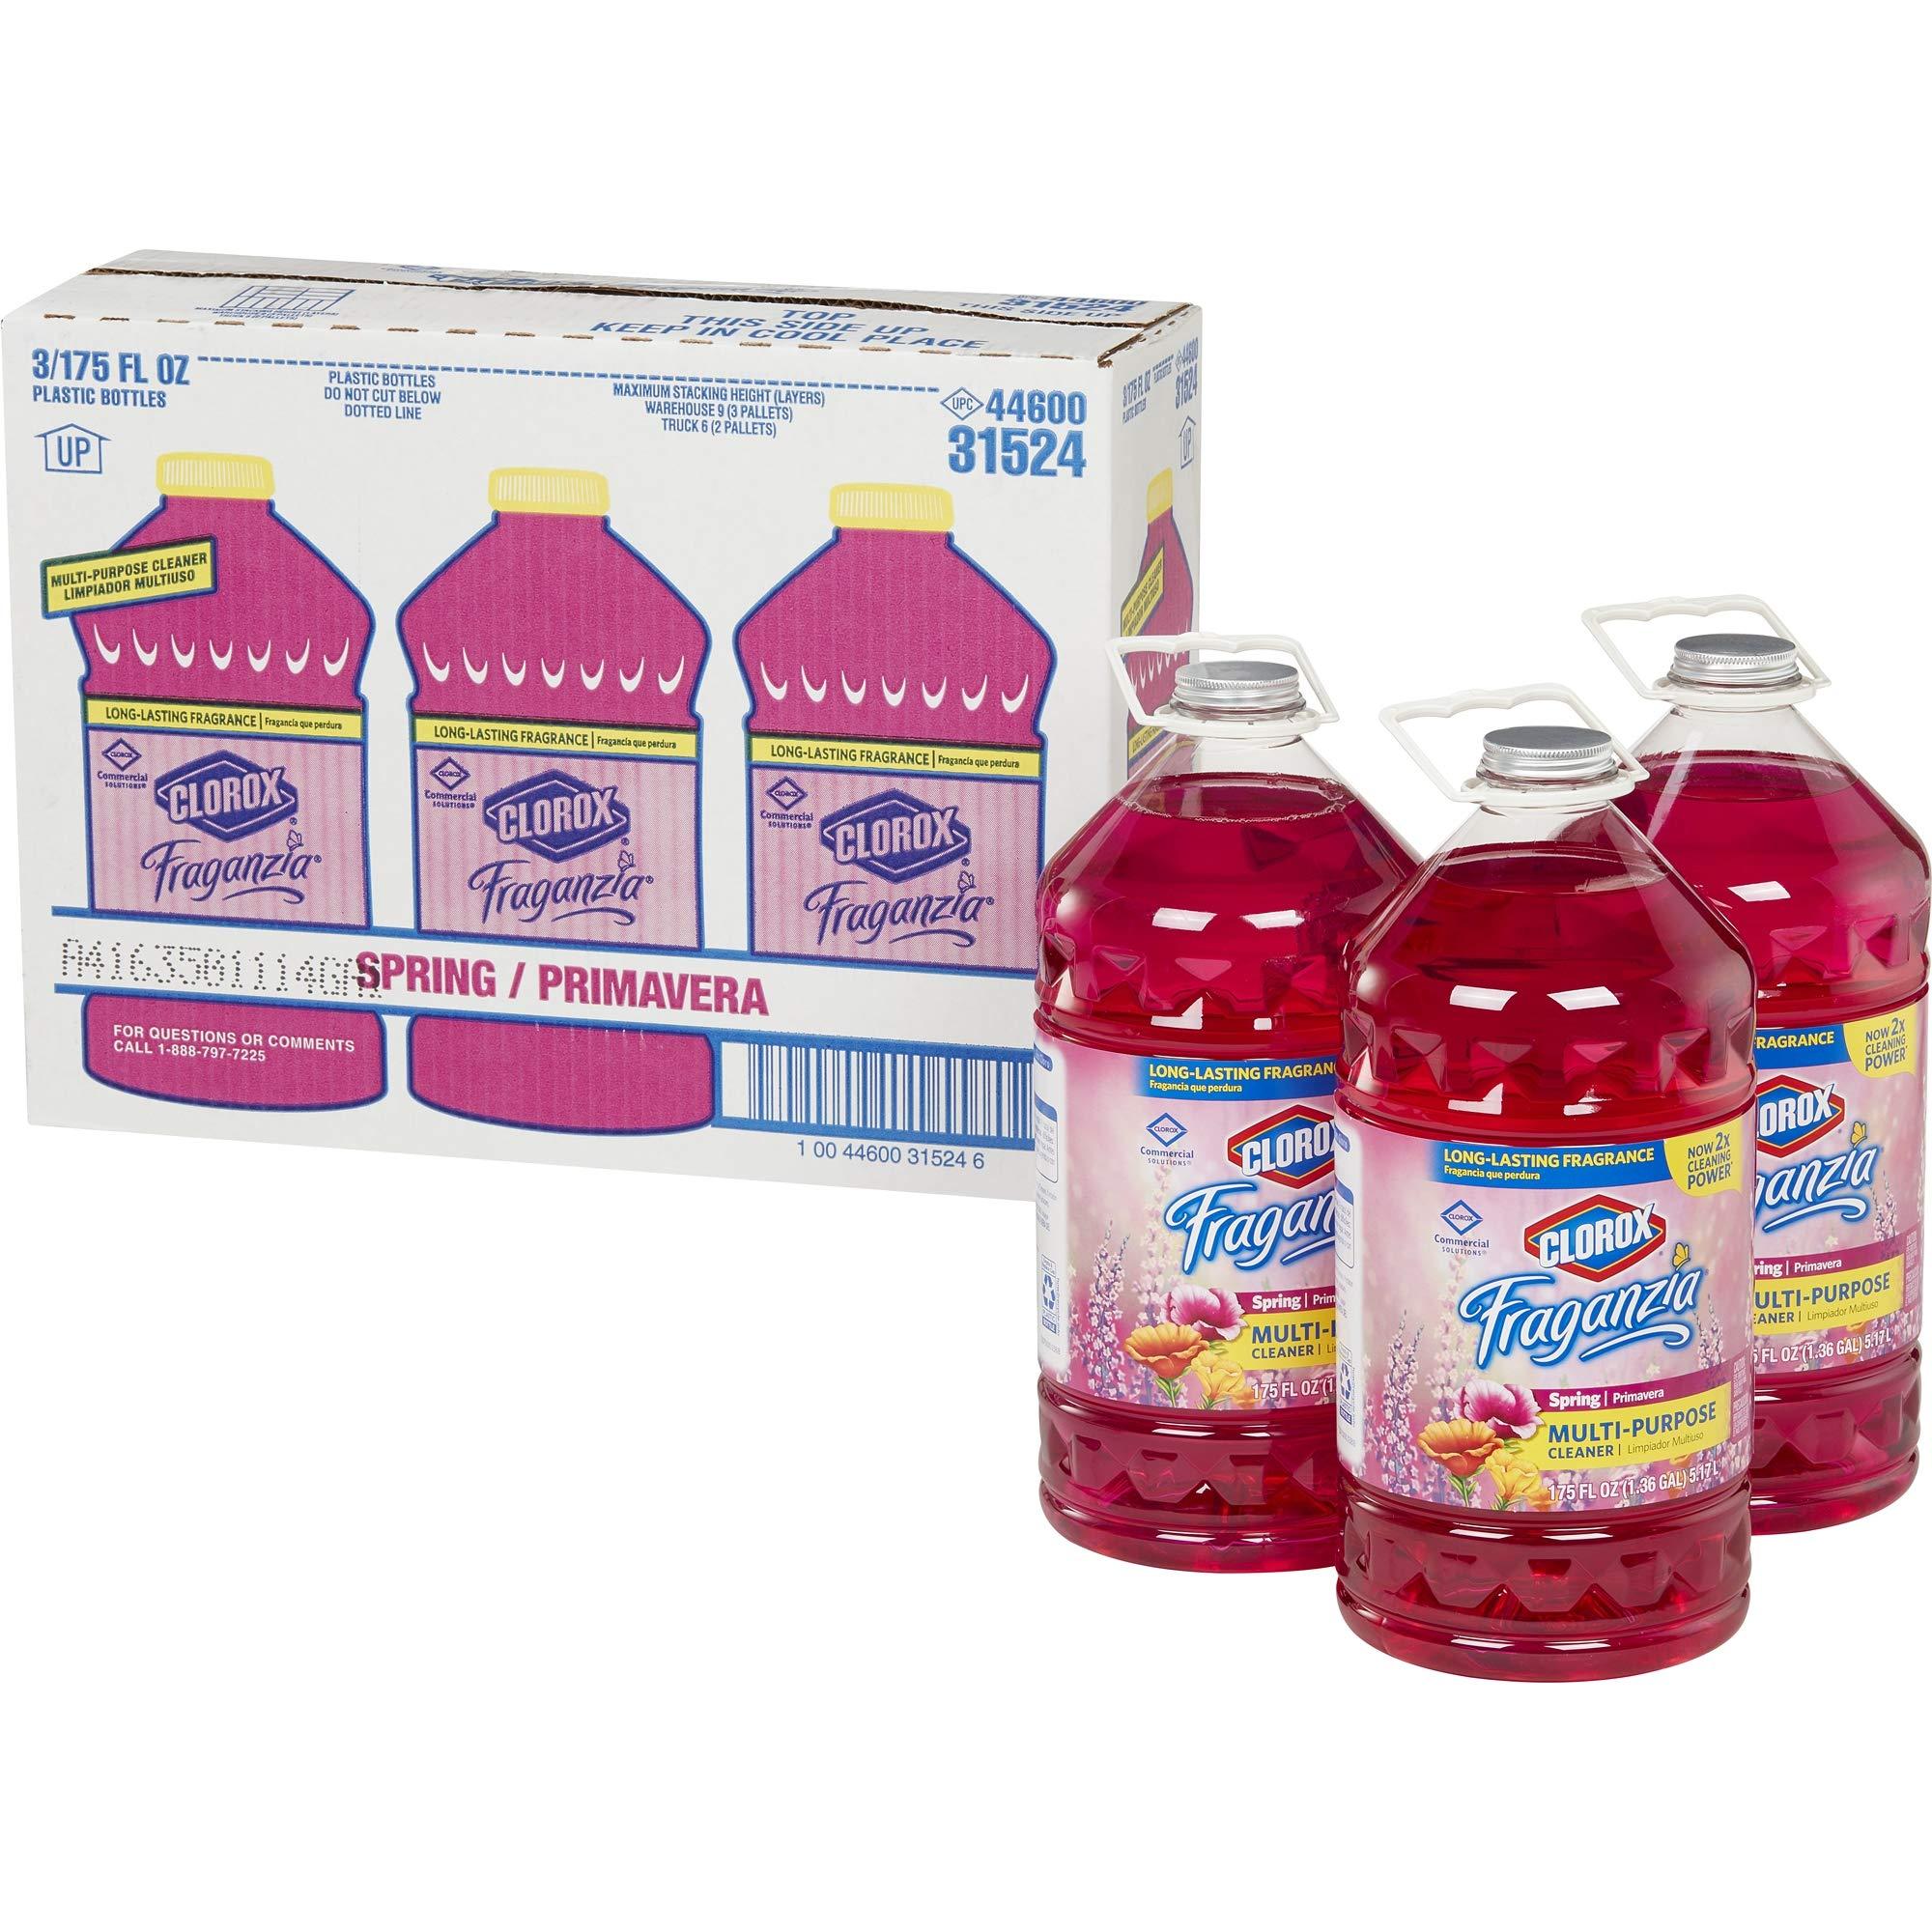 Clorox Fraganzia Multi-Purpose Cleaner, Spring, 175 Ounces, 3 Bottles/Case (31524)